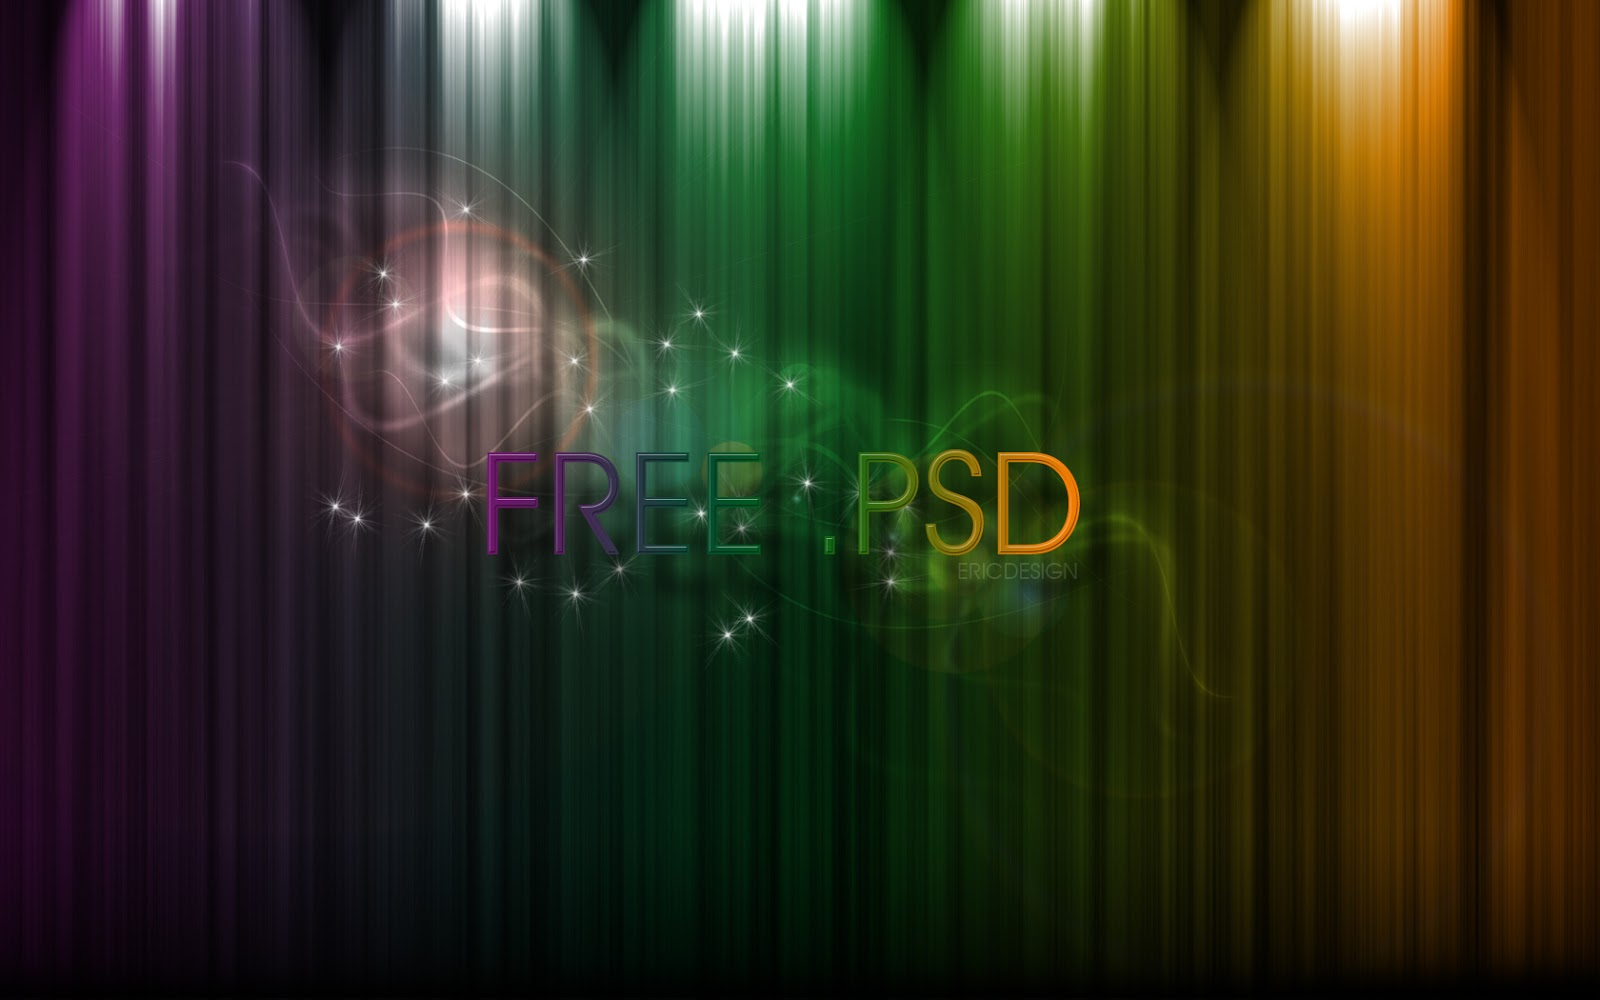 Free Photoshop PSD